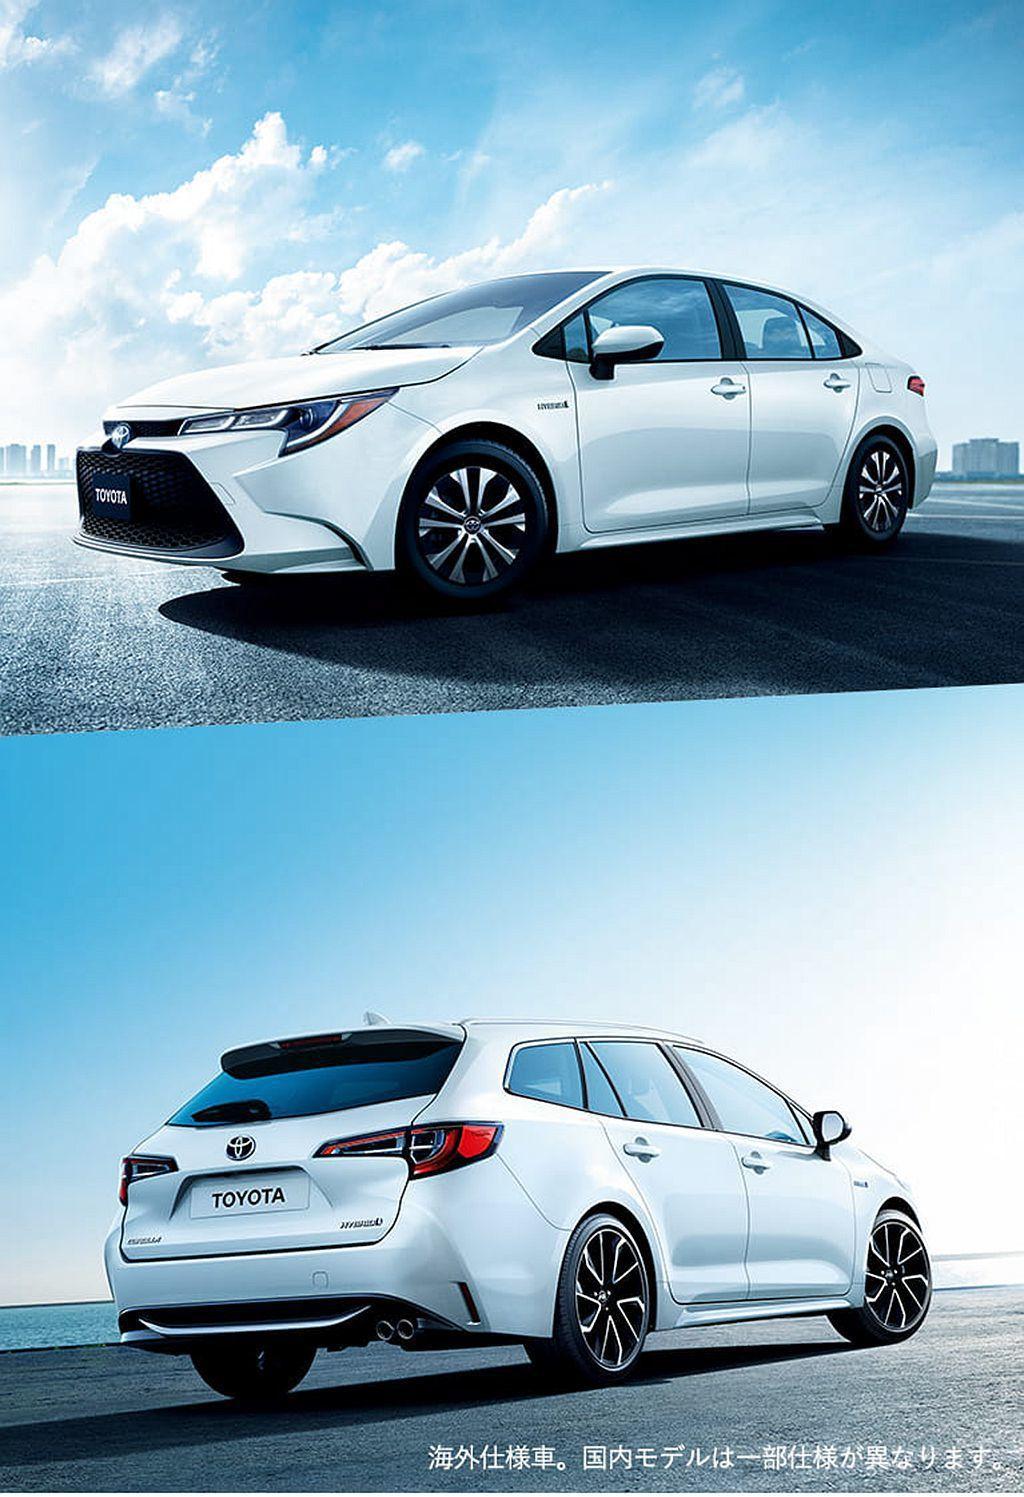 全新Toyota Corolla/Corolla Touring確定日規車型上市...